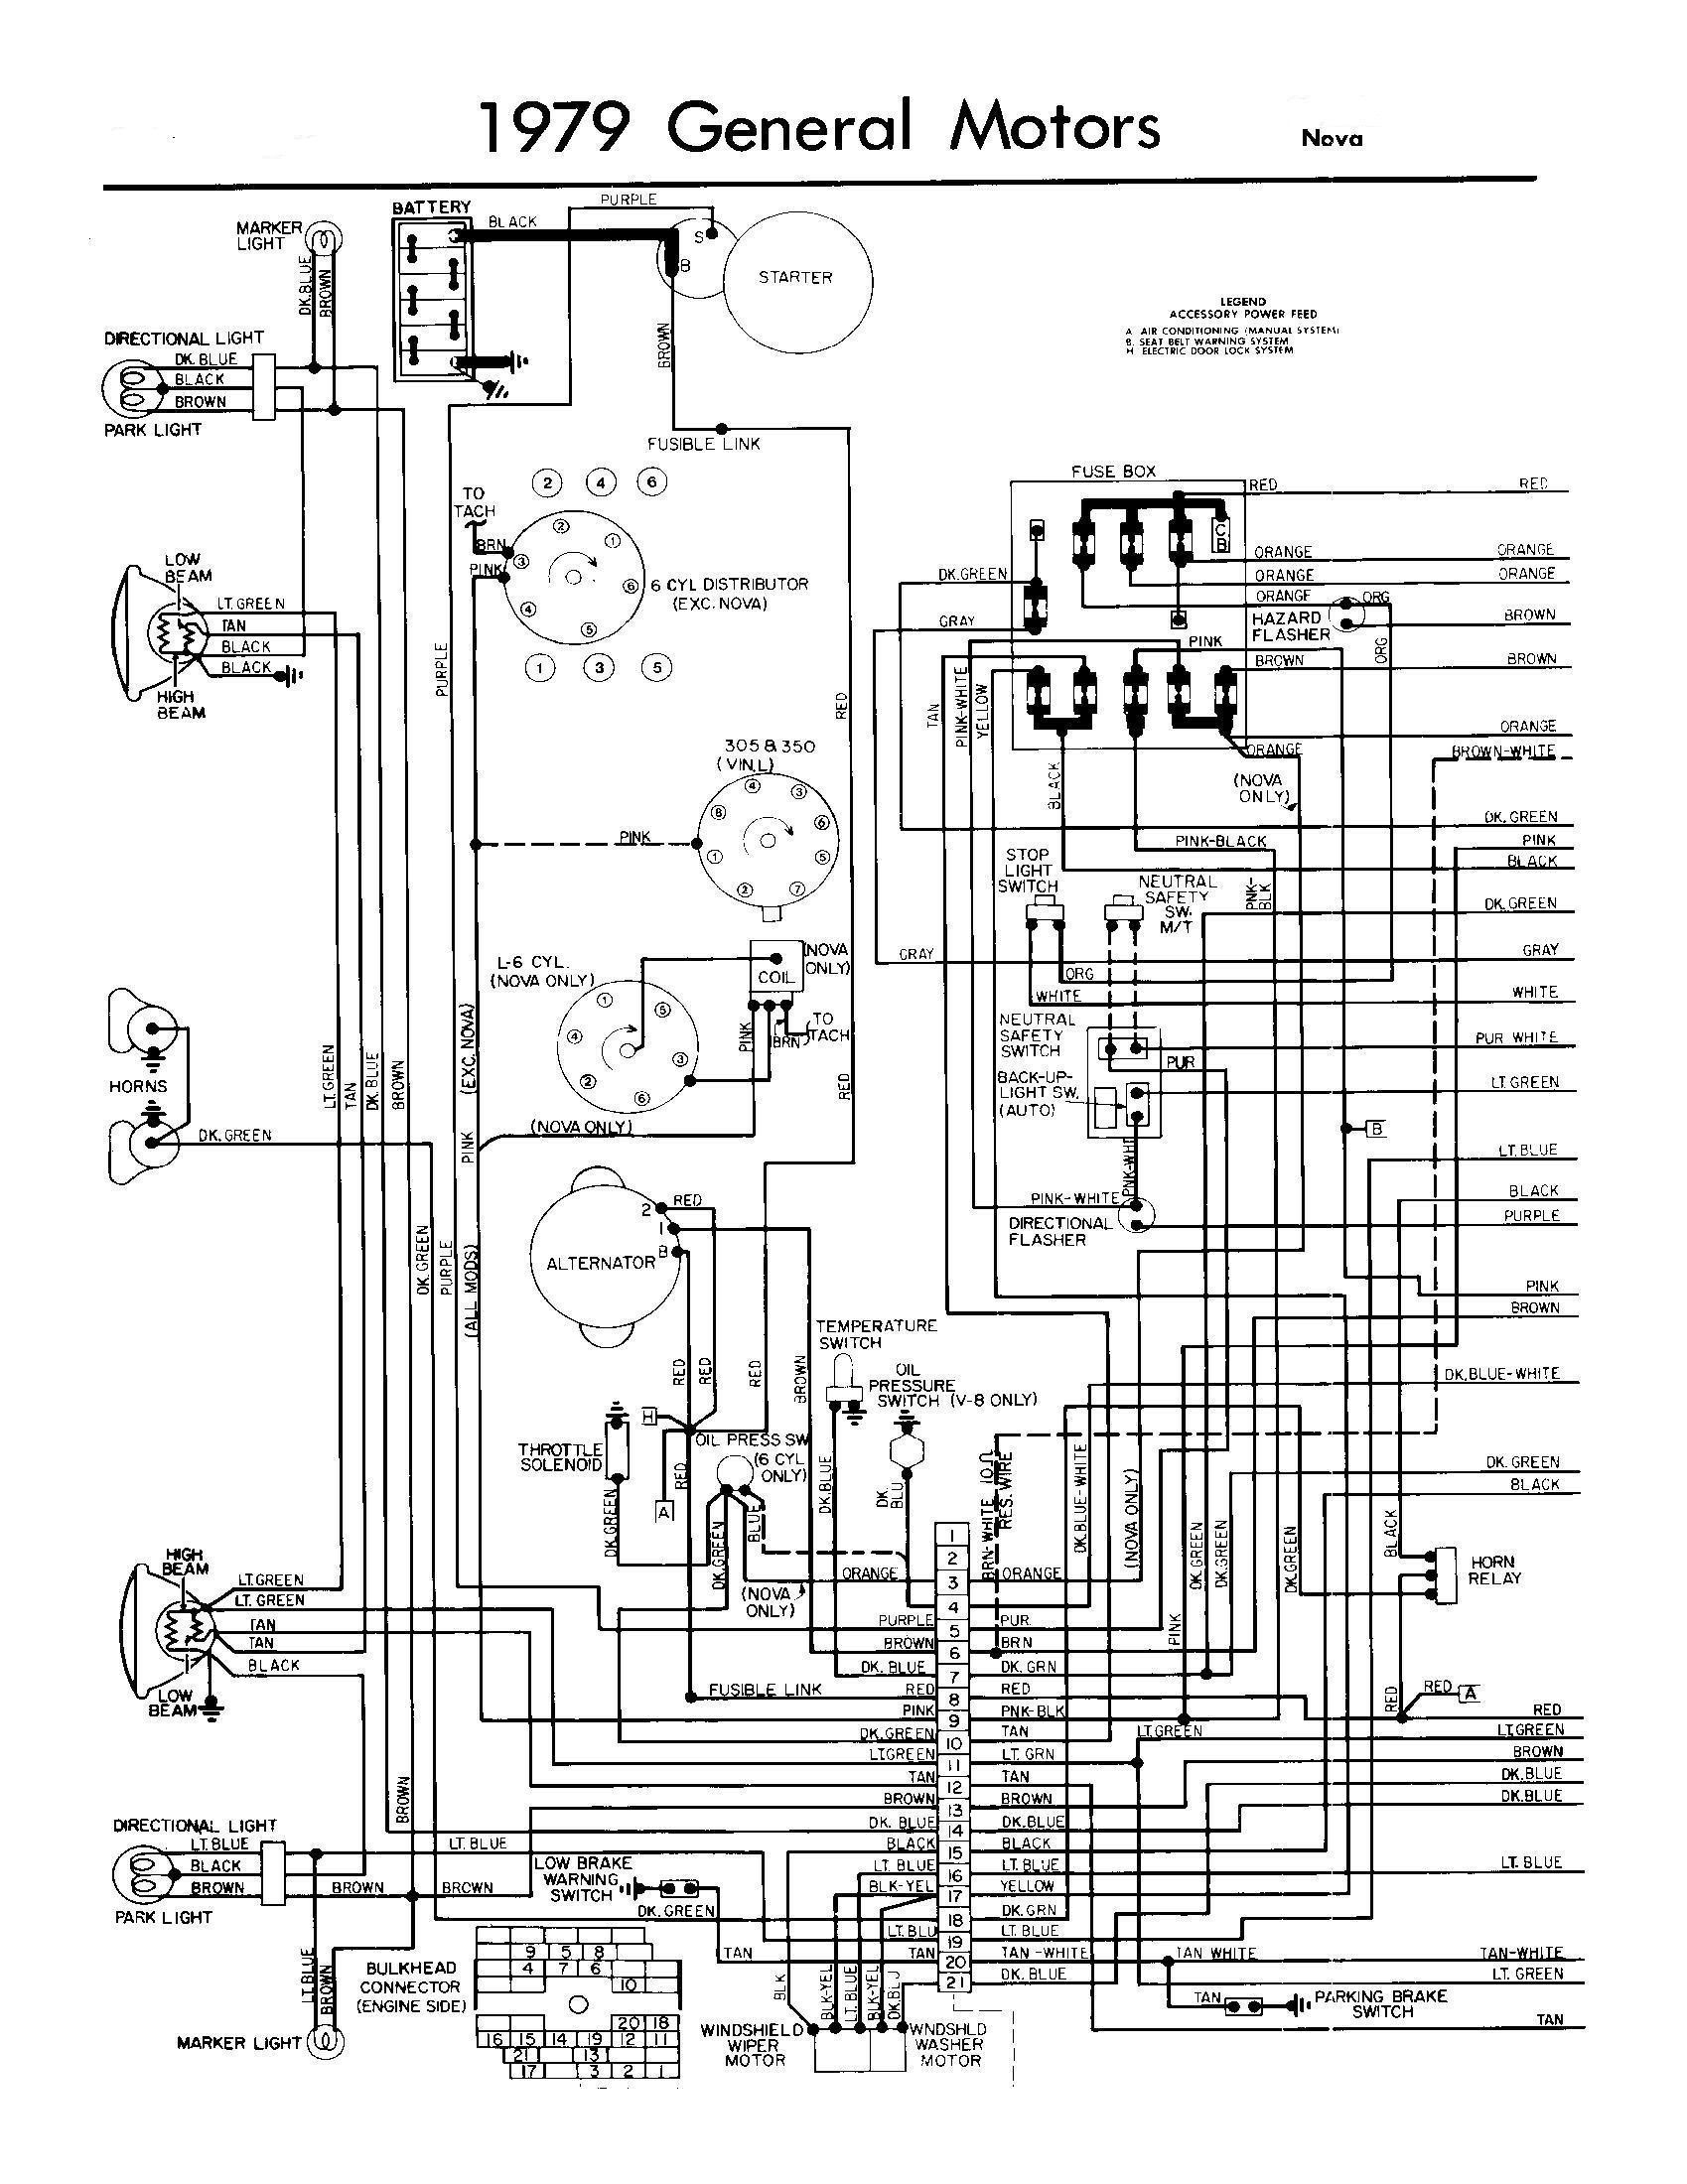 C70 Wiring Diagram - Wiring Diagram Data - 1990 Chevy 1500 Fuel Pump Wiring Diagram